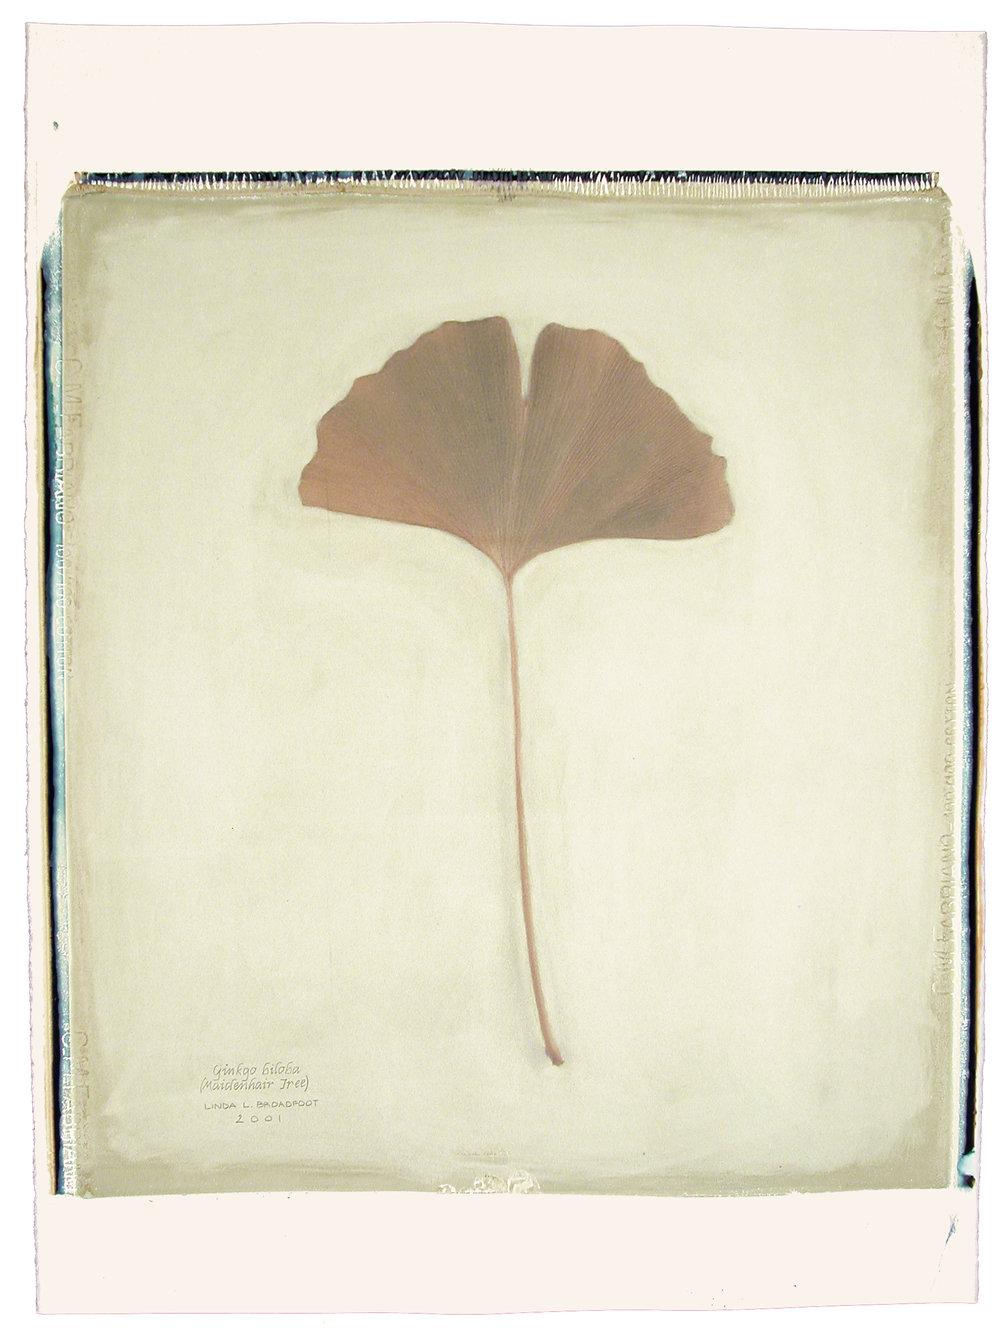 Ginkgo biloba  (Maidenhair Tree), 2001